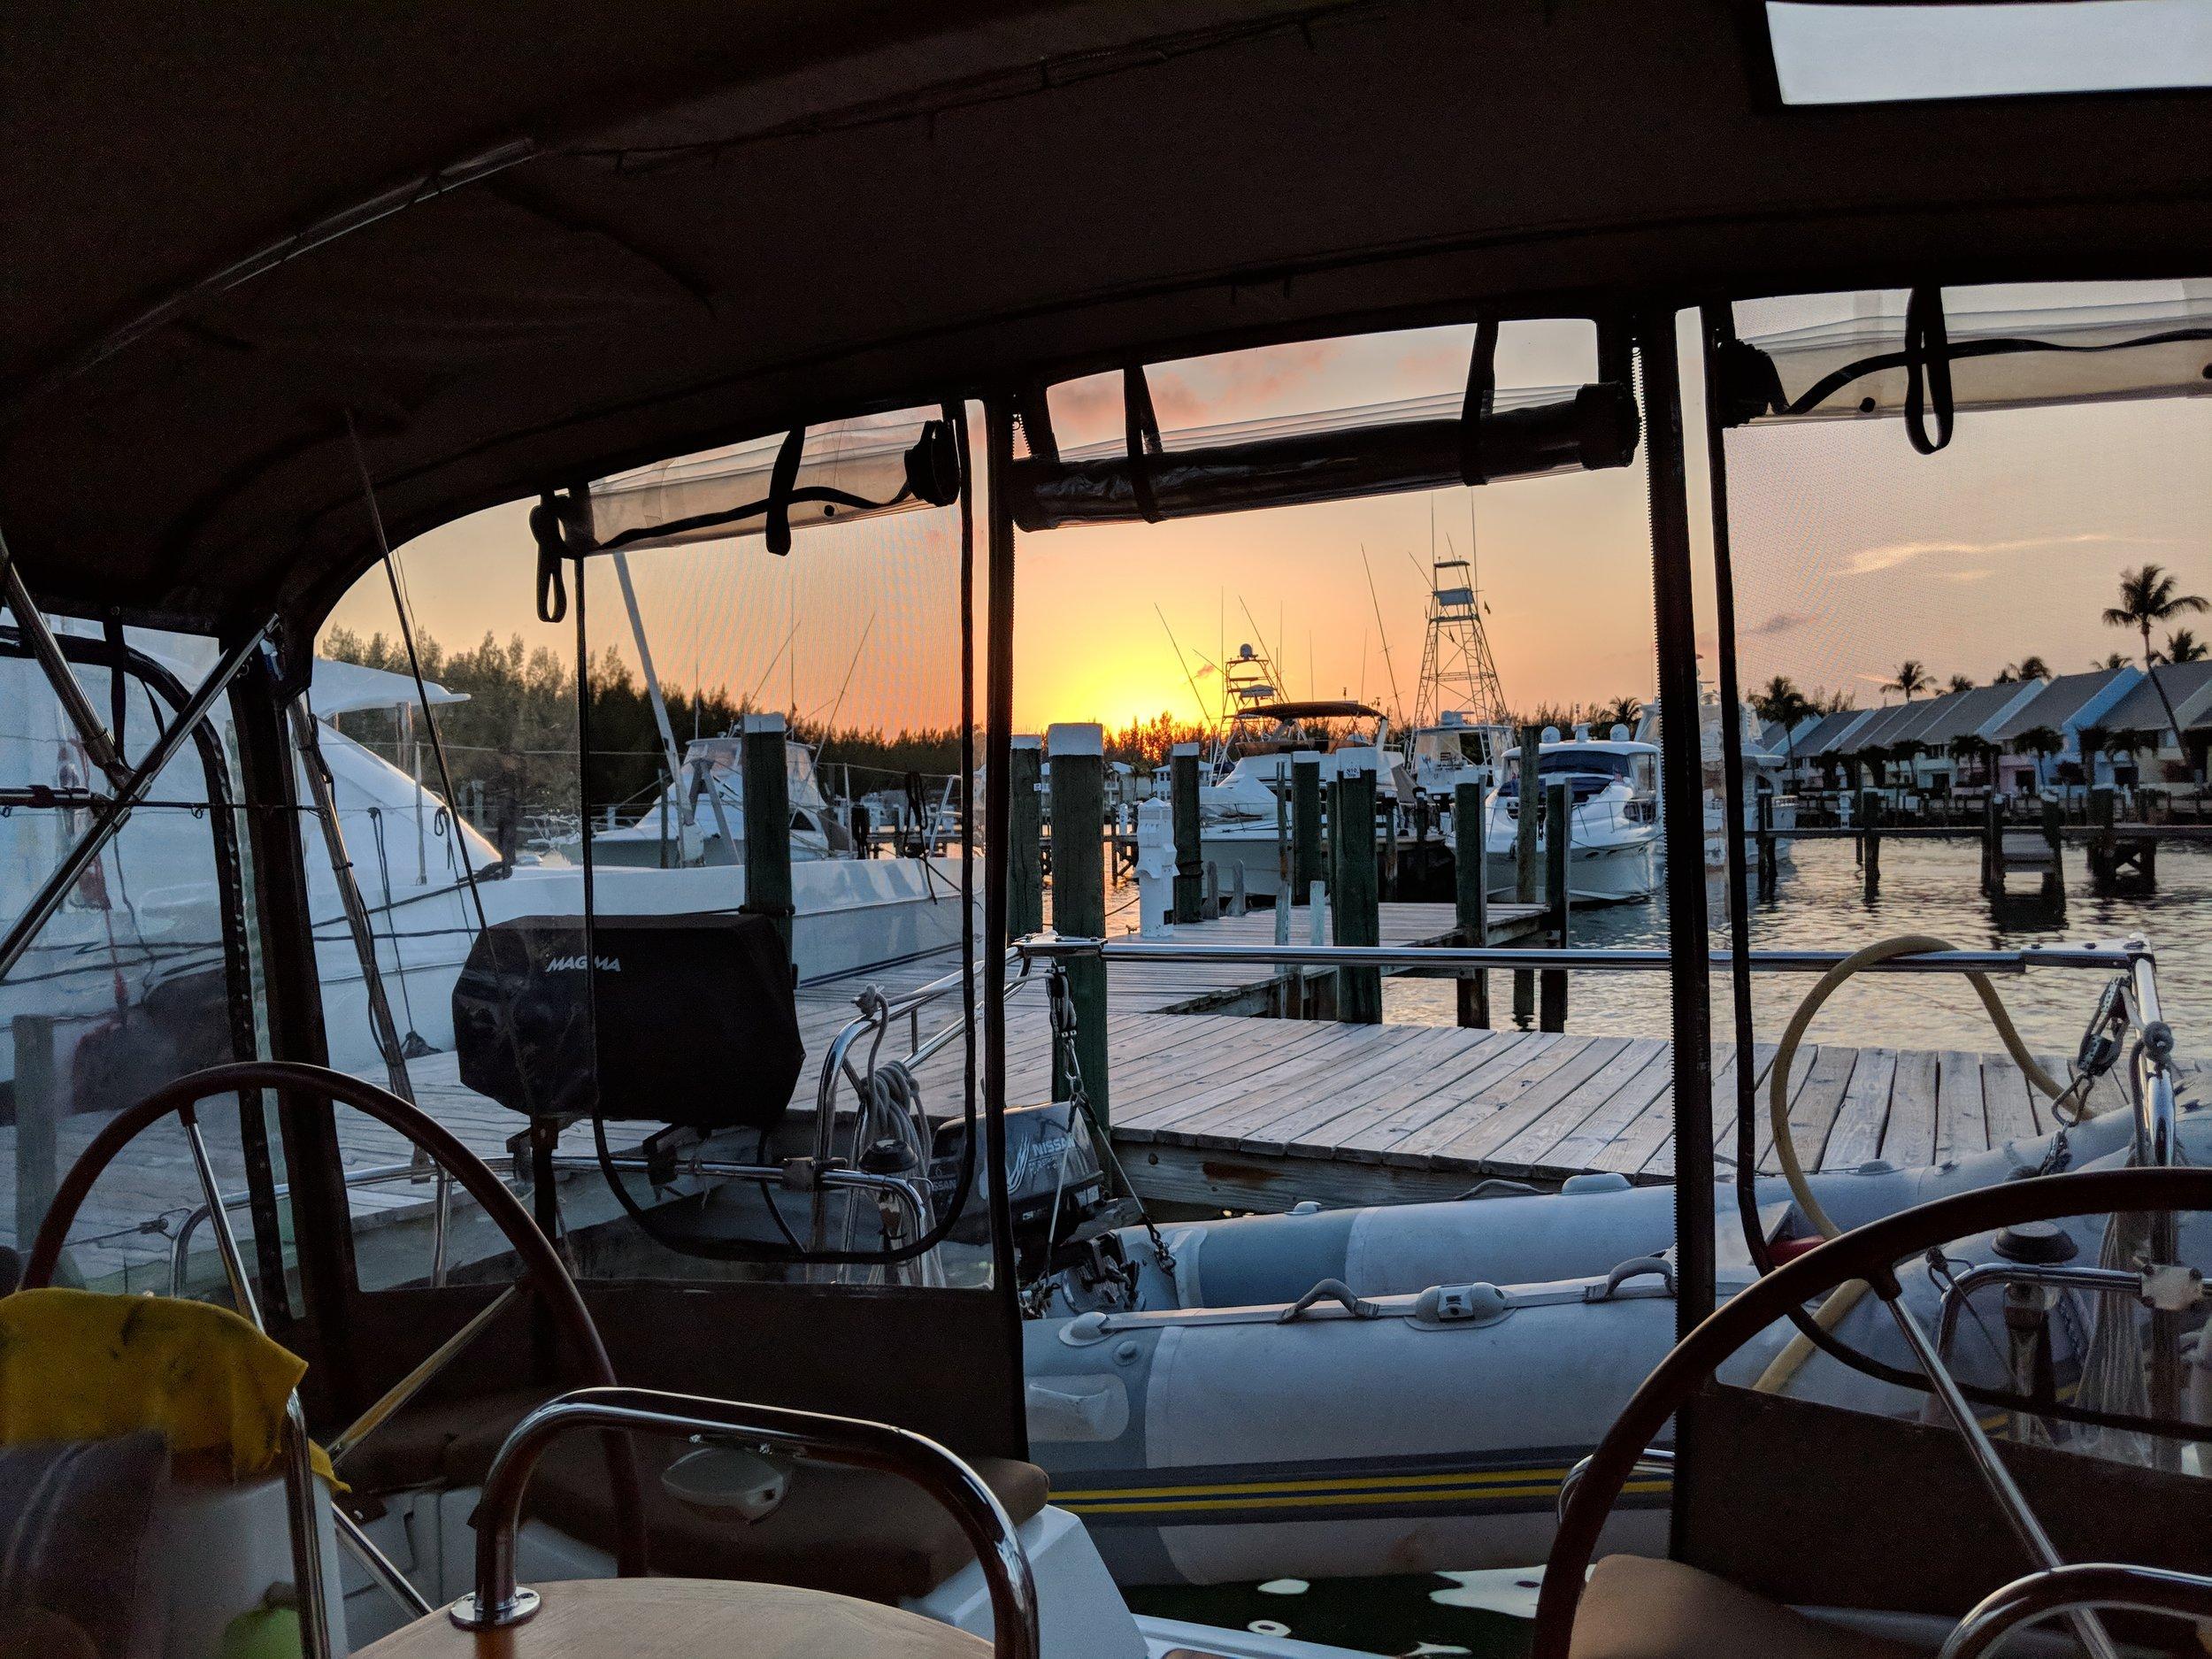 Sunset at the marina.